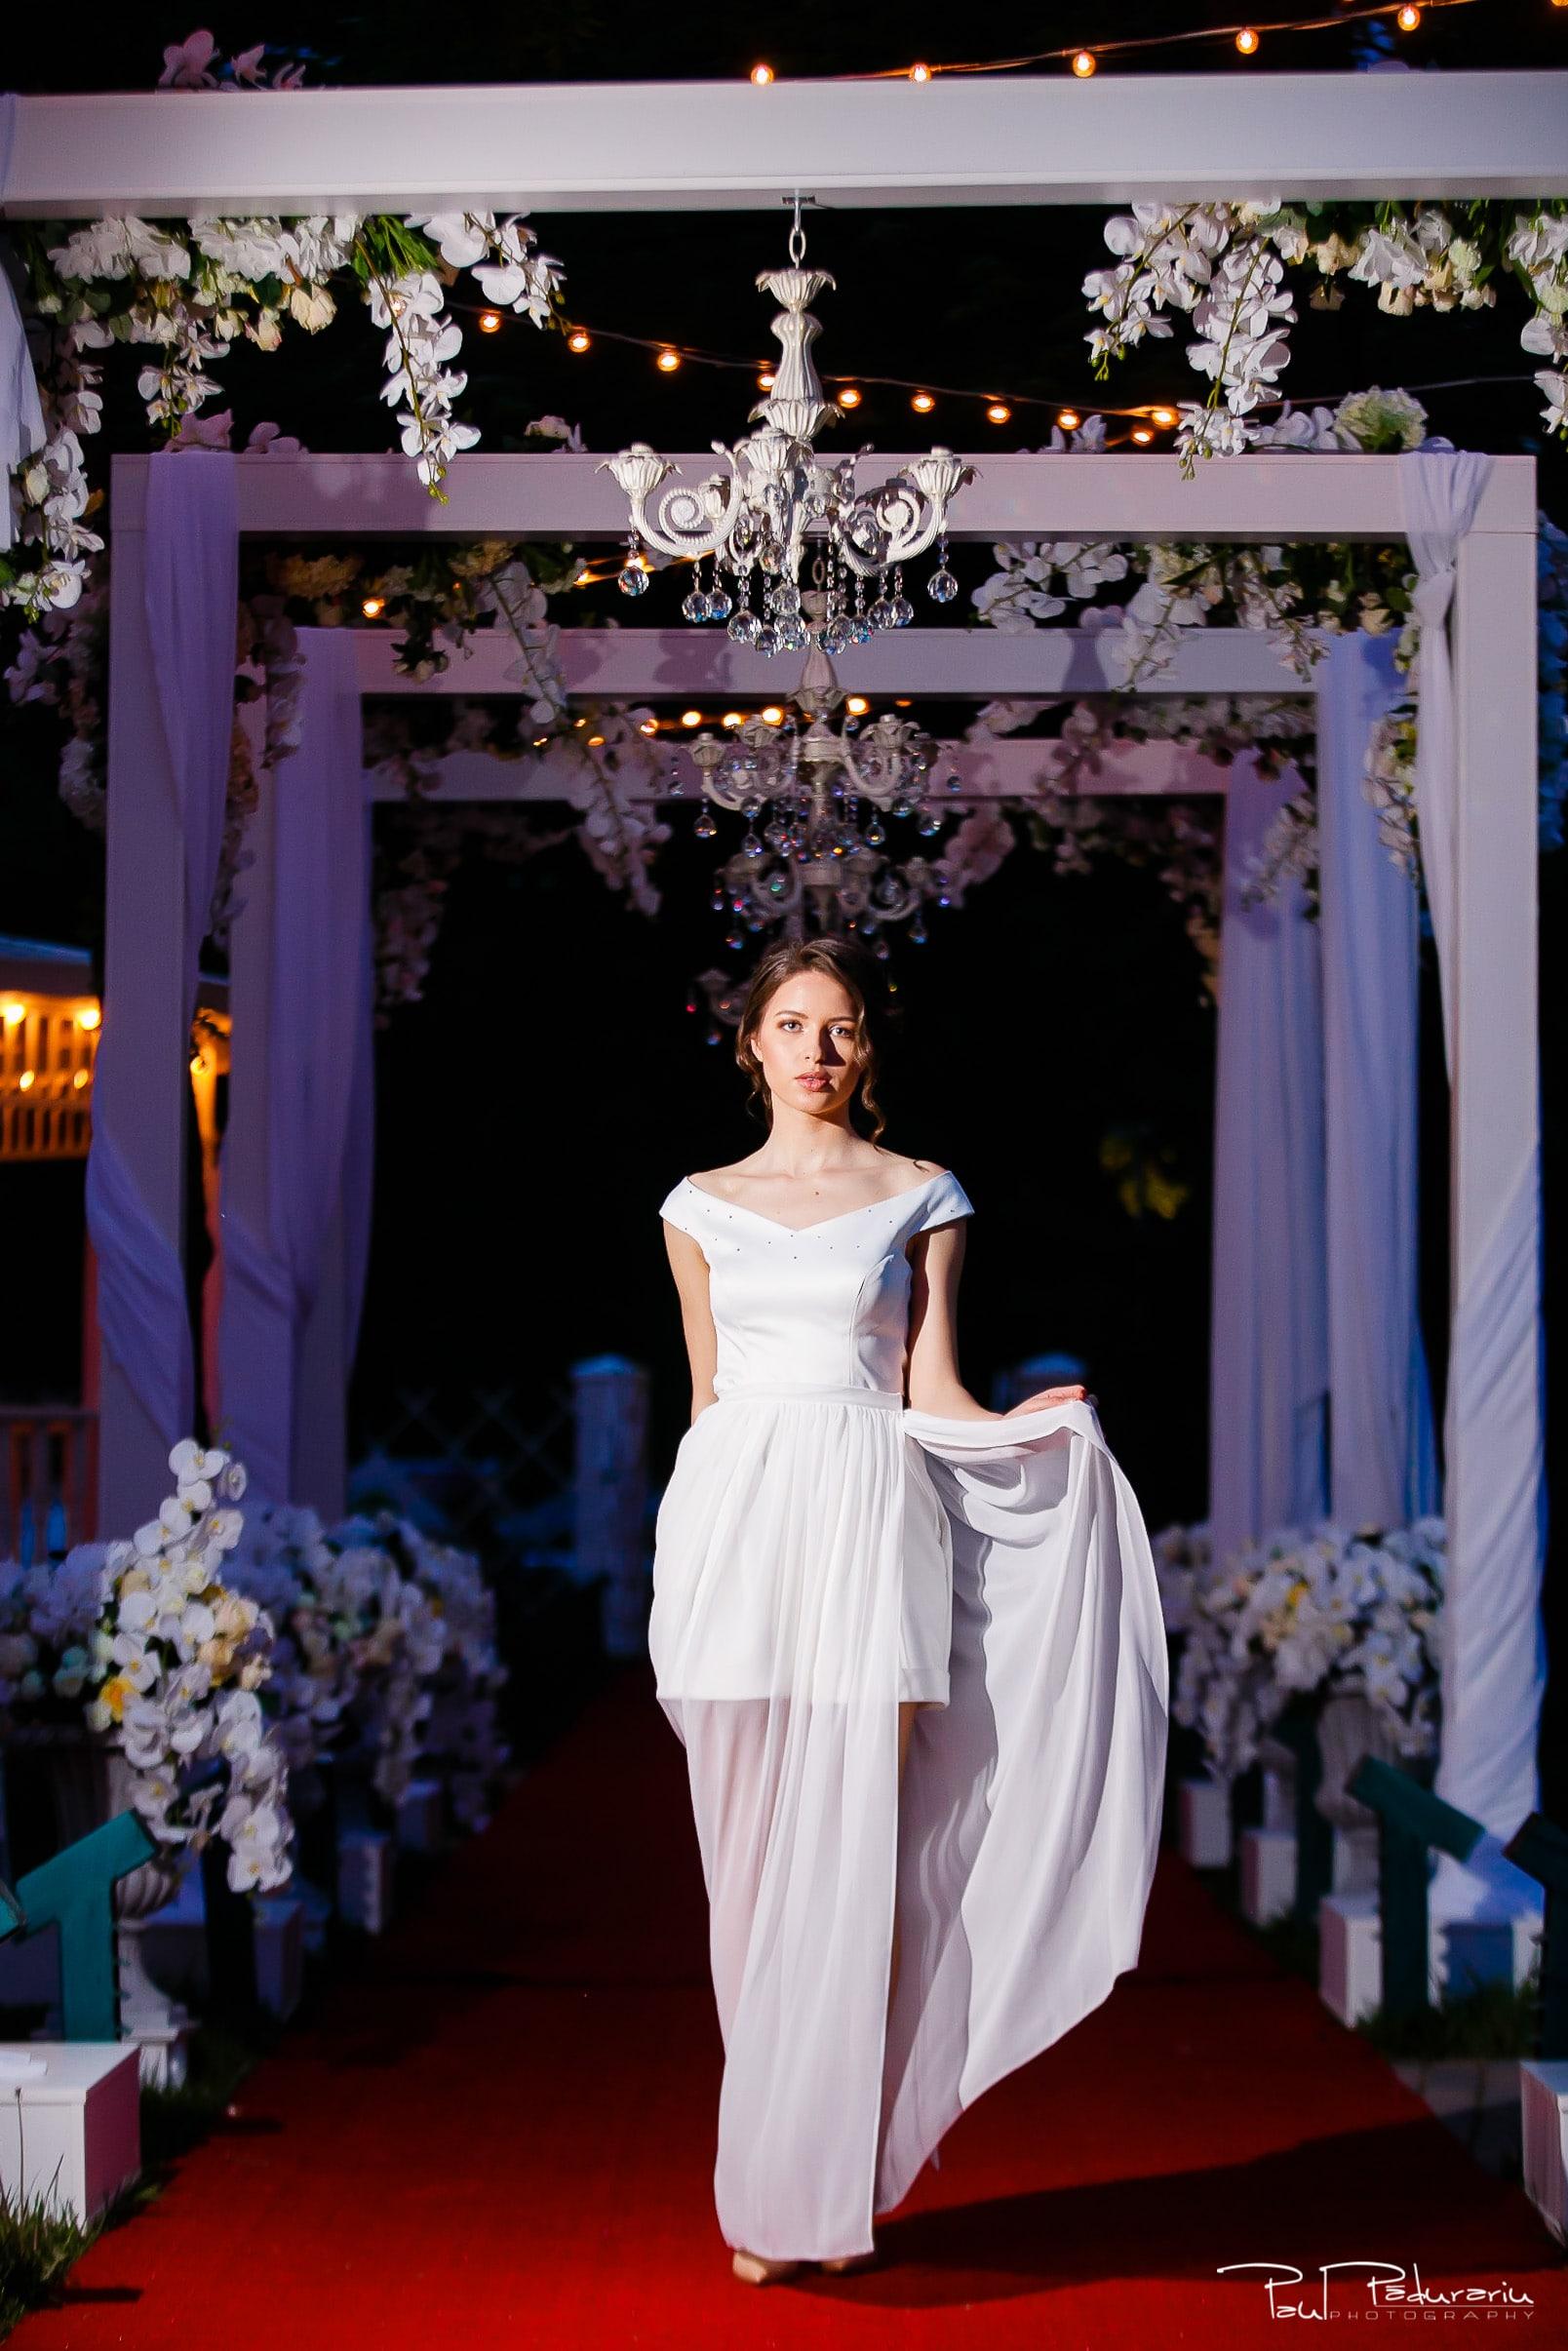 Modern Bride Edith Val colectie rochie mireasa 2019 - fotograf profesionist iasi paul padurariu | nunta iasi 17